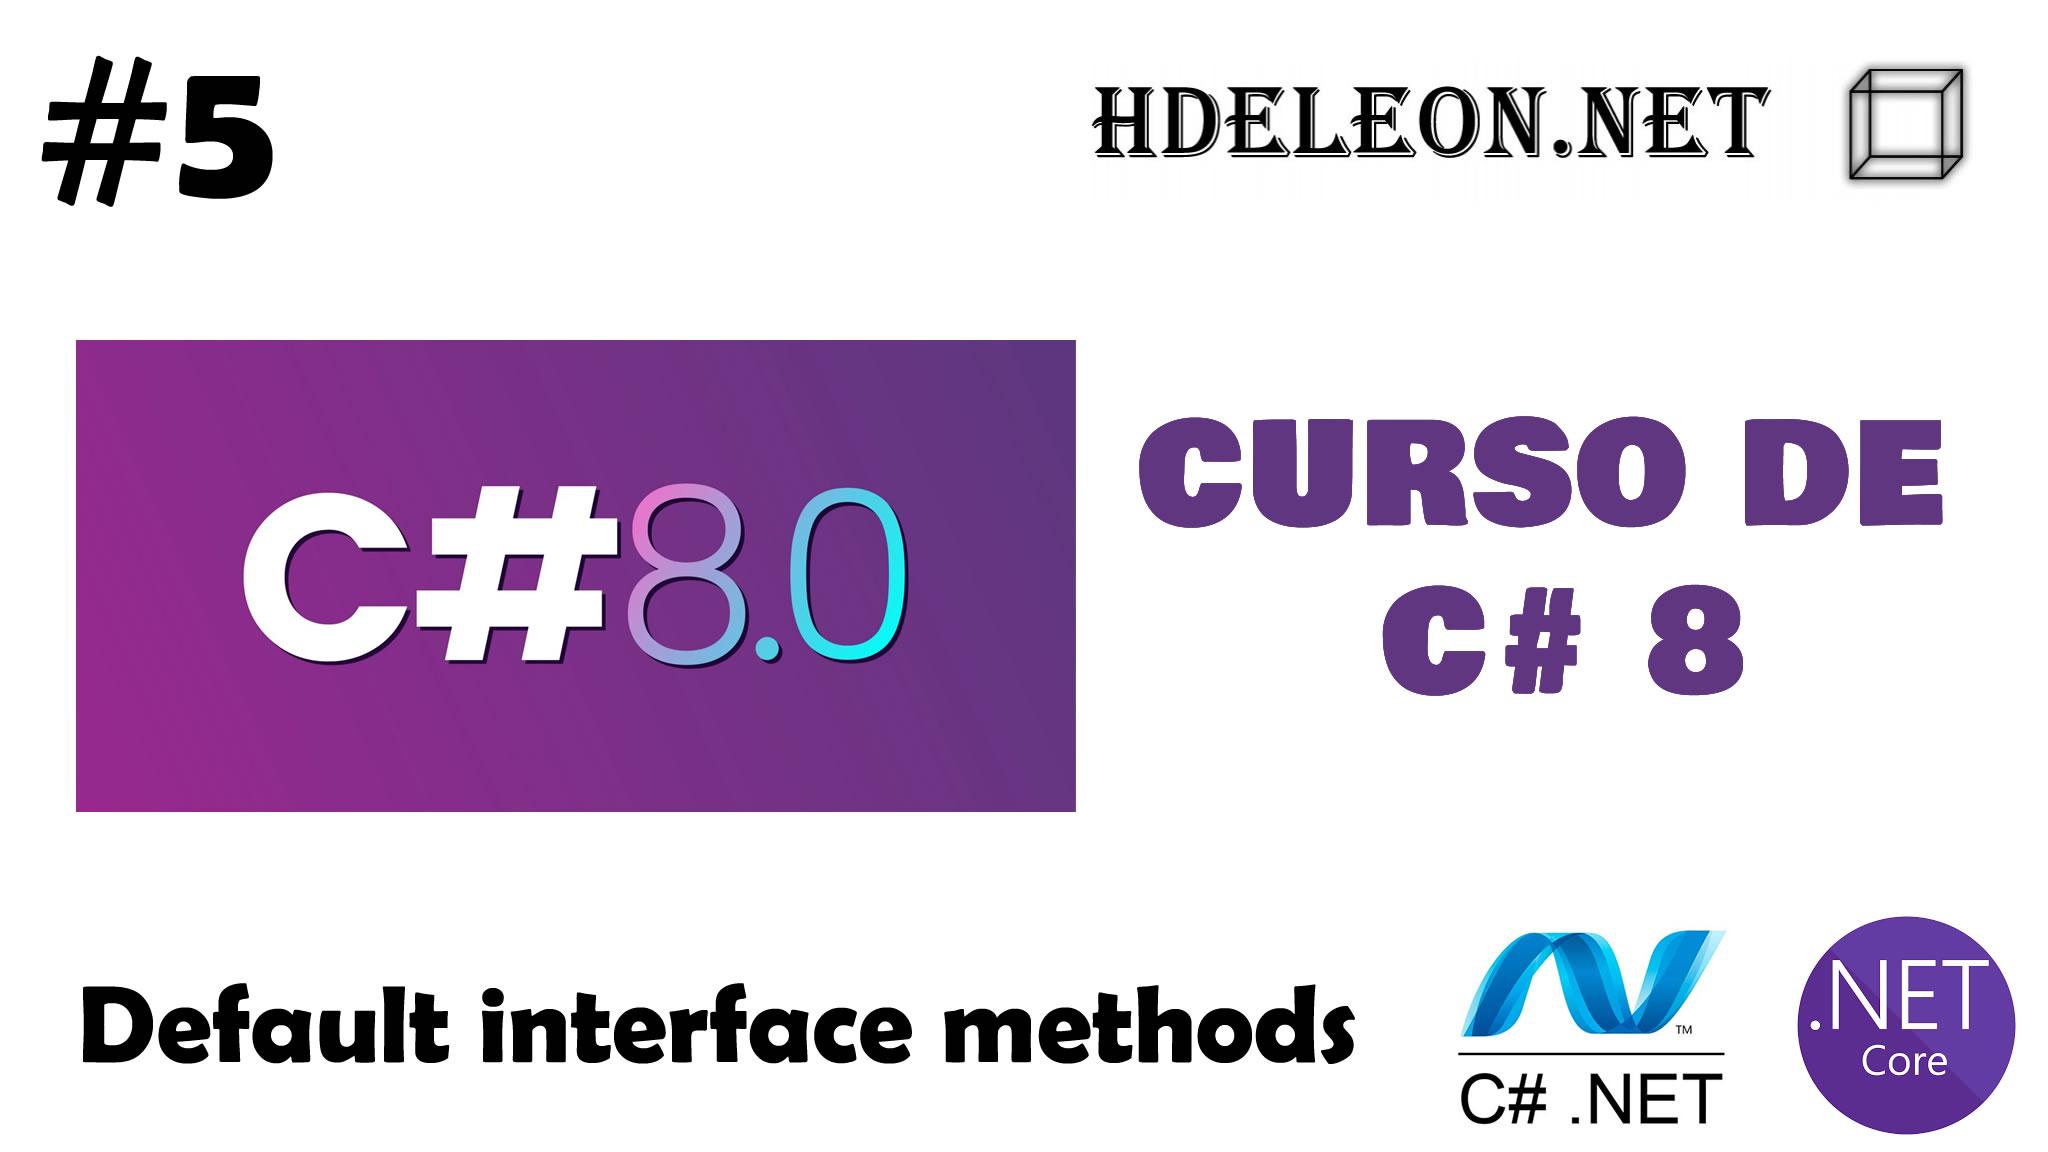 Curso gratuito de C# 8 .Net, Default interface methods, #5